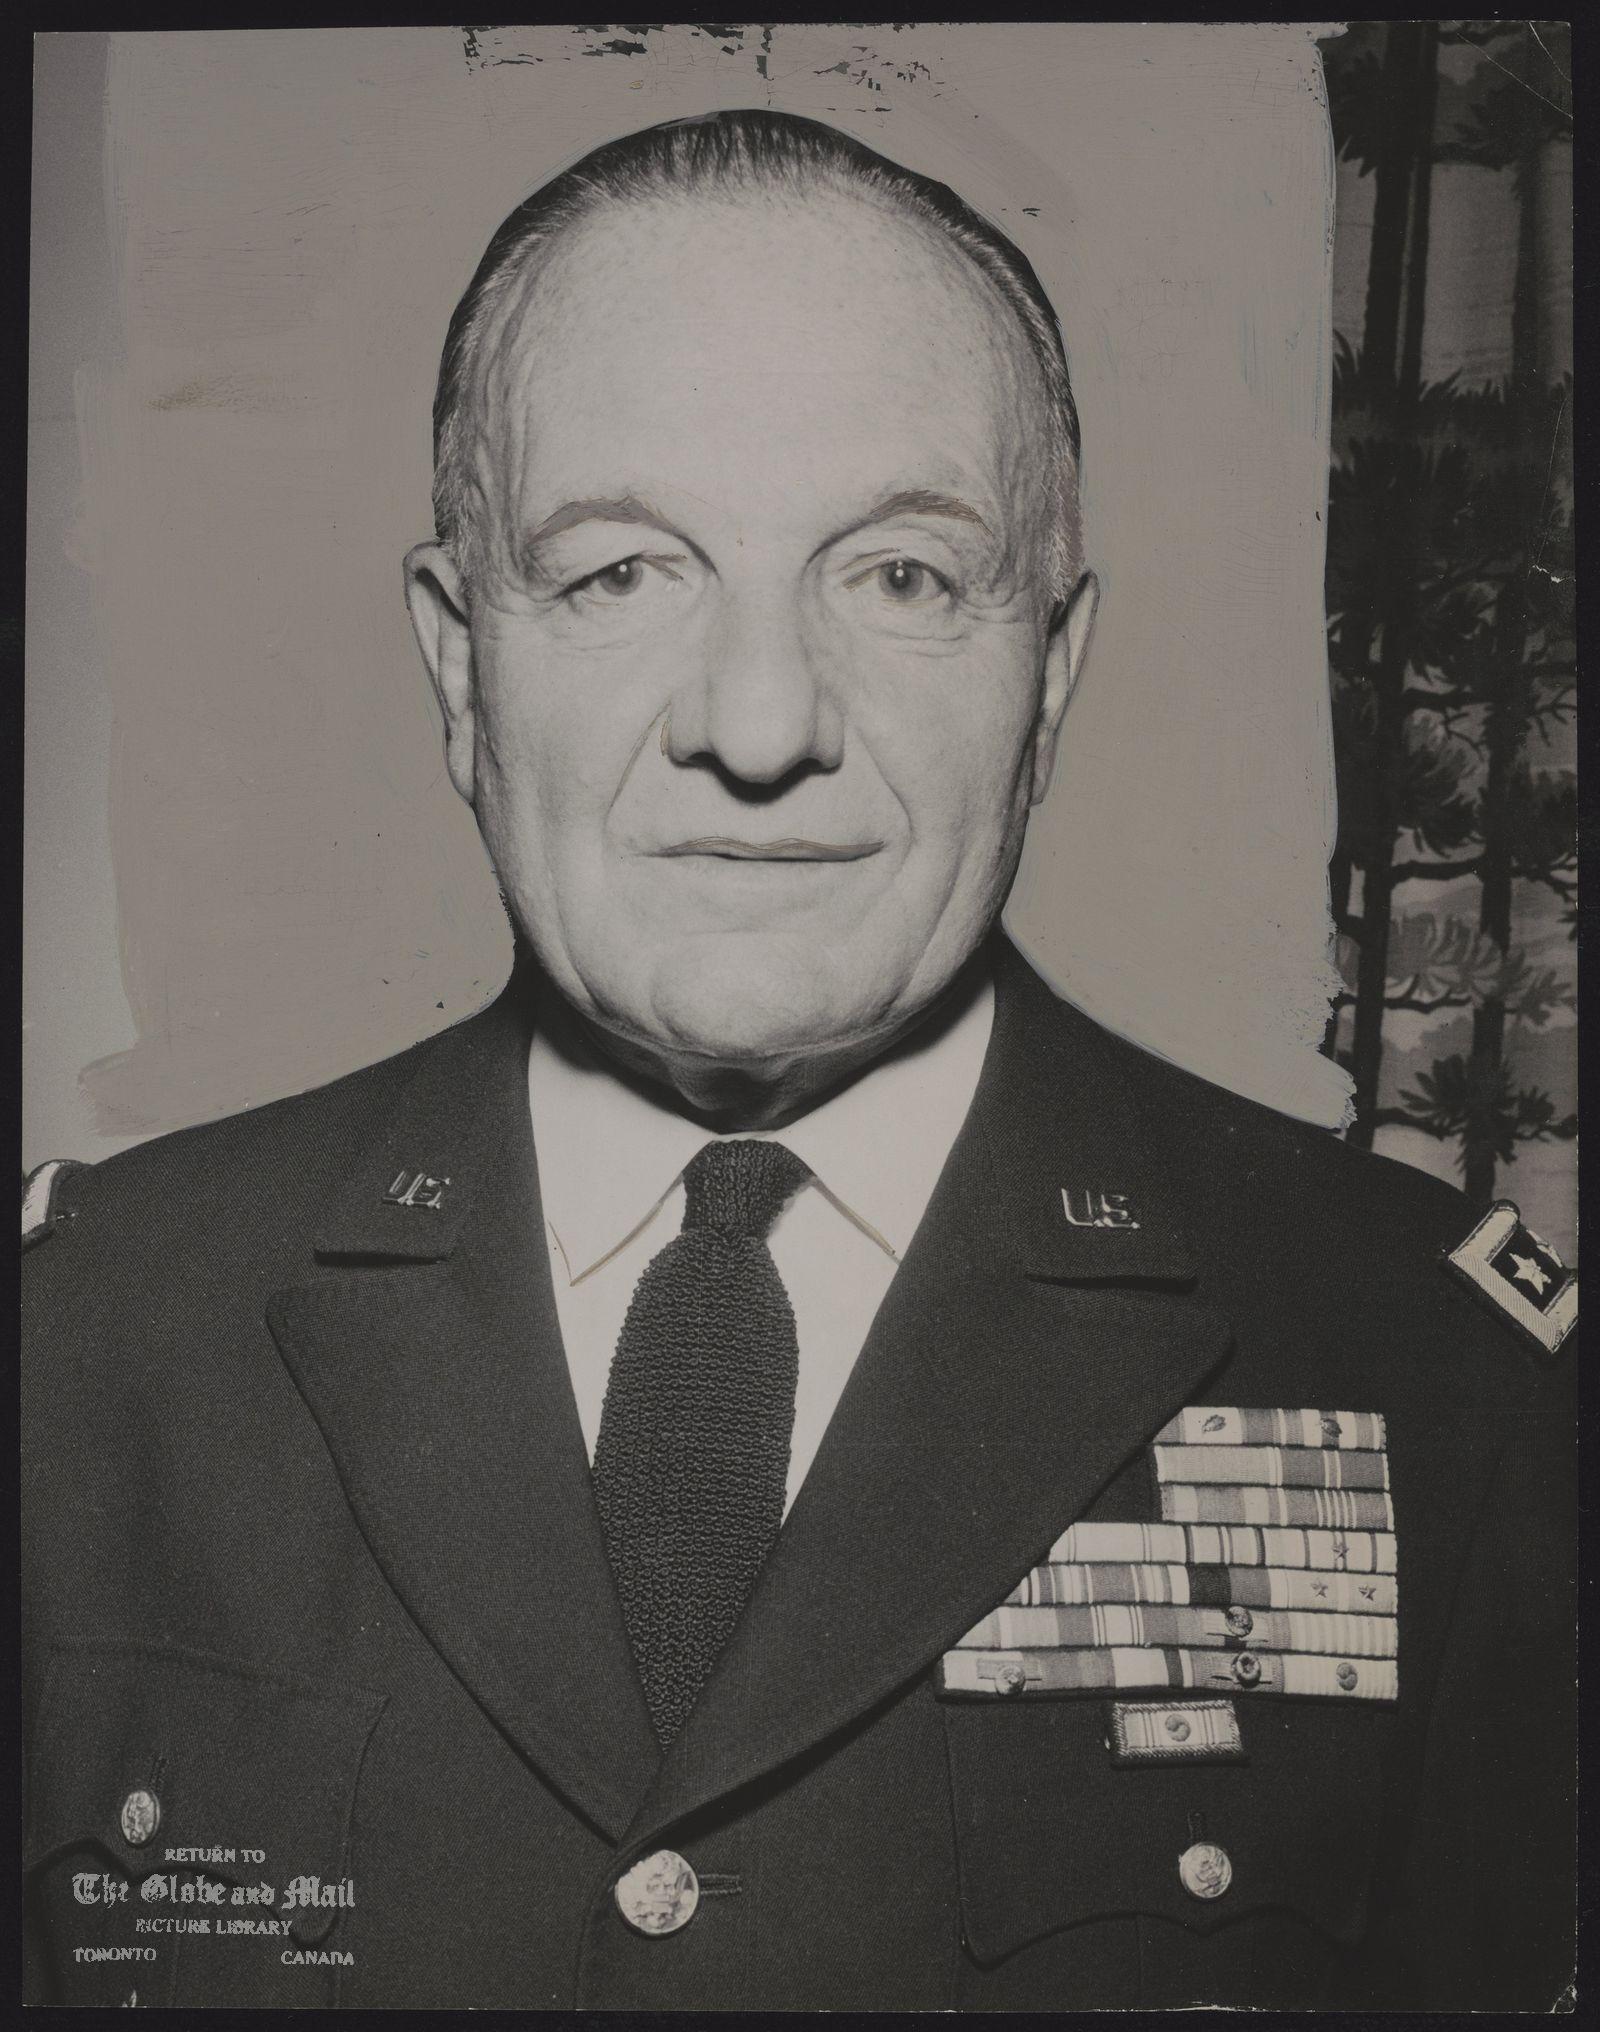 (LT. GEN) ARTHUR TRUDEAU U.S. Army Lt. General Arthur Gilbert Trudeau in Toronto